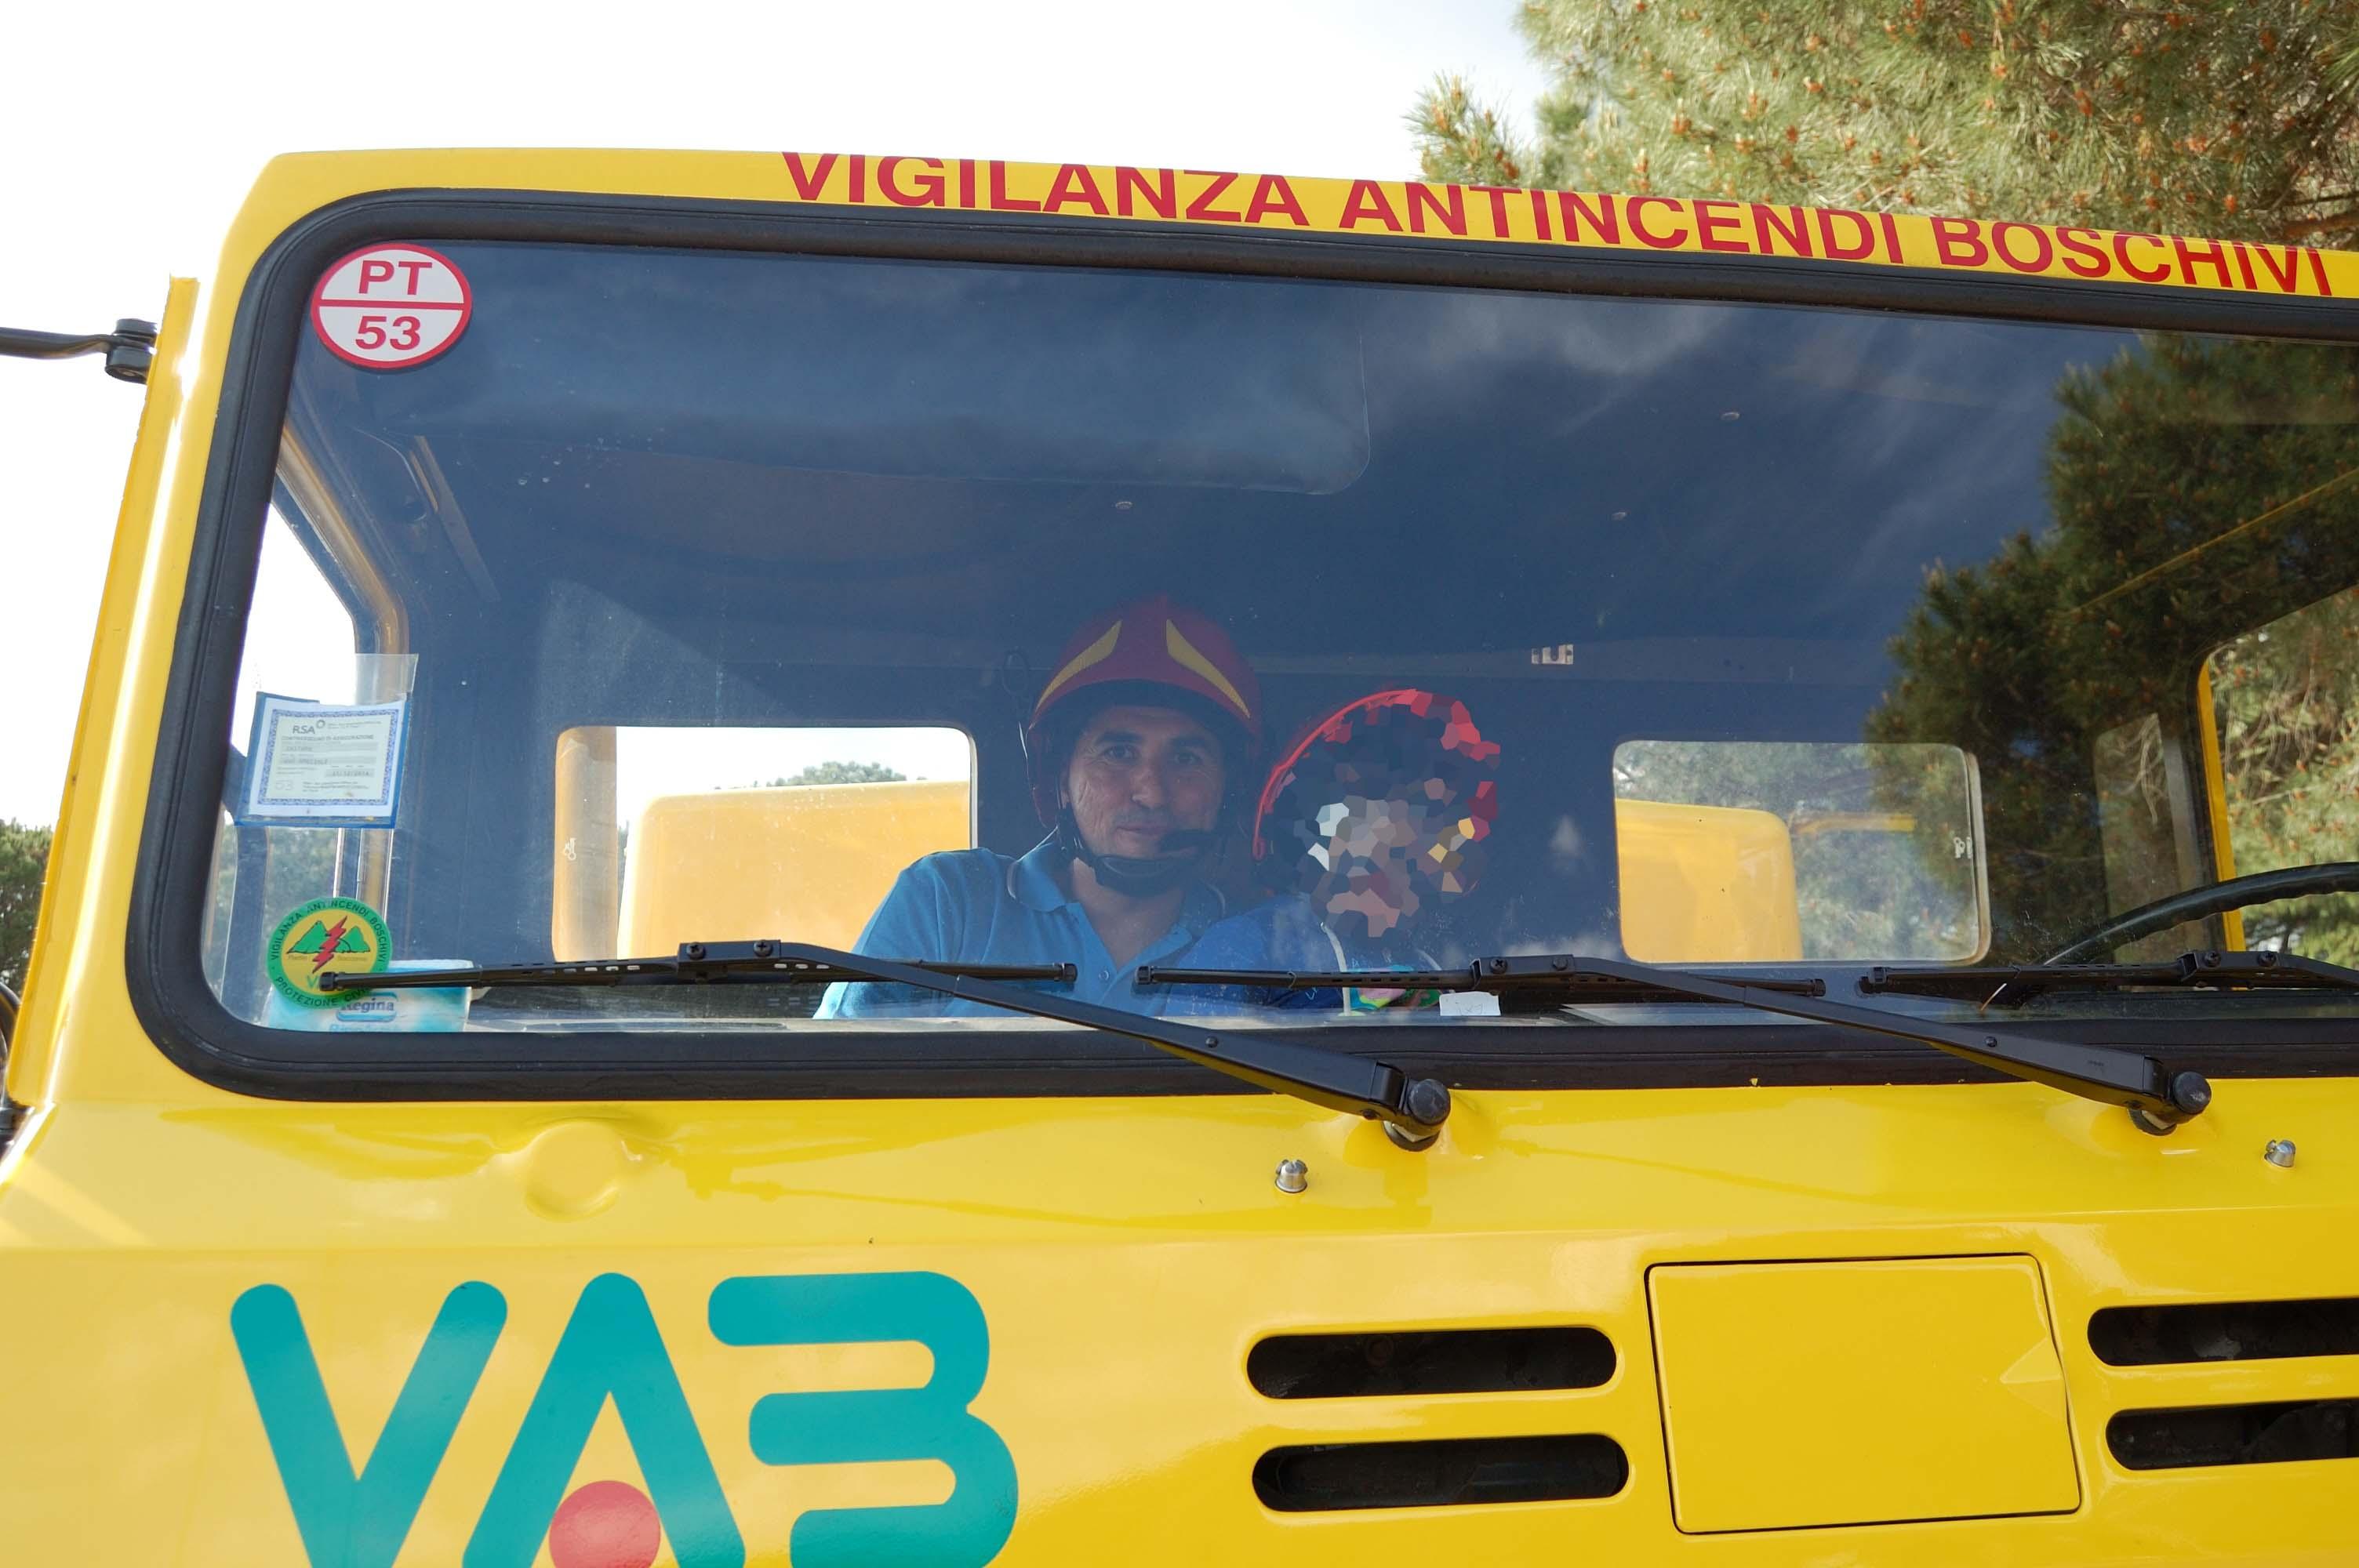 Bimbimbici & Pompieropoli 2014: ti ricoderemo così!